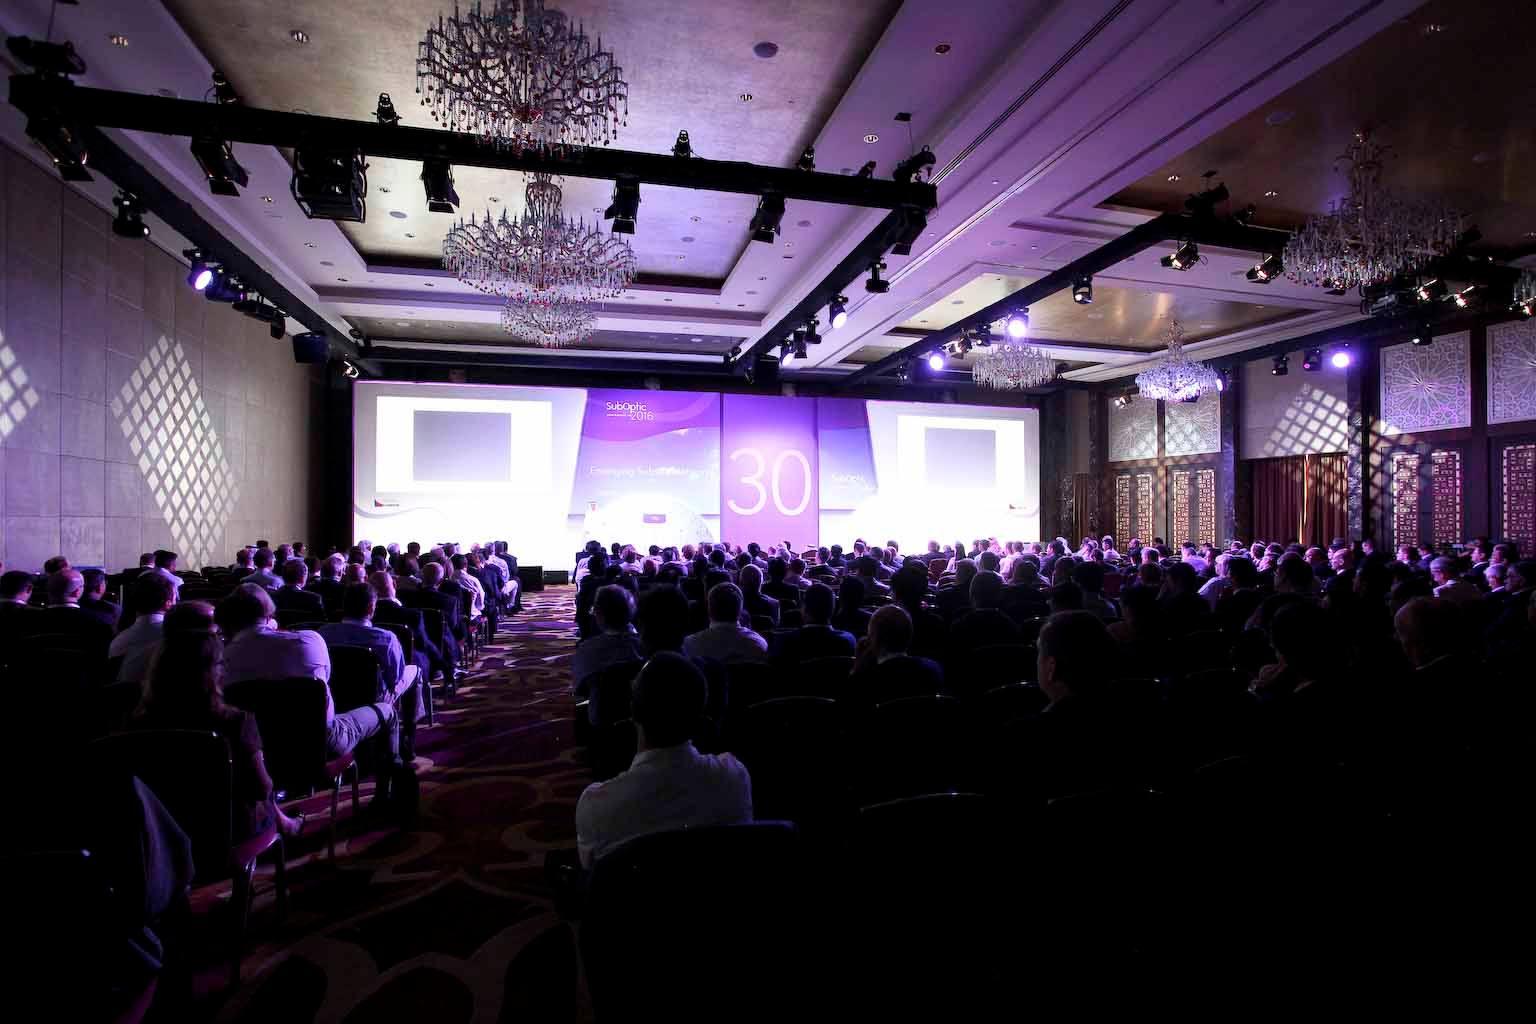 Crowd shot of the SubOptic 2016 keynote speaker.